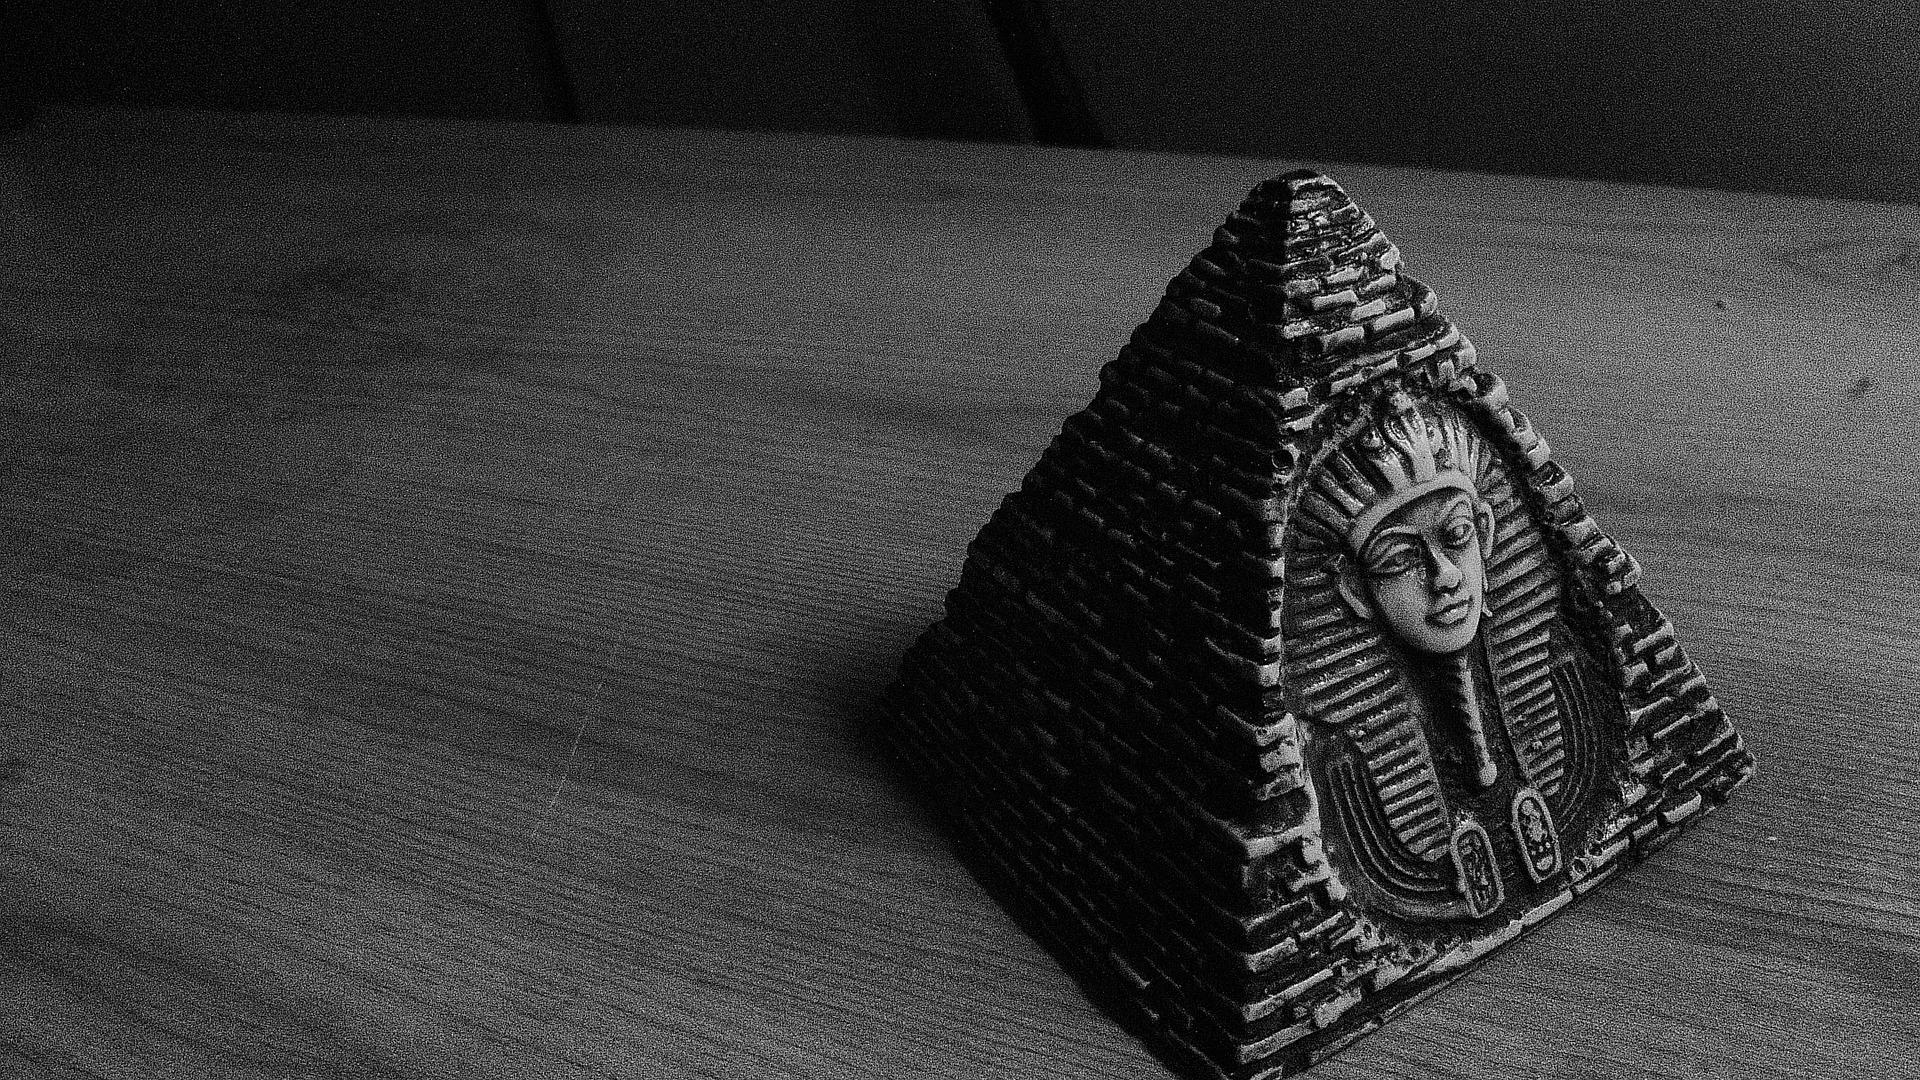 Faraonii negri1